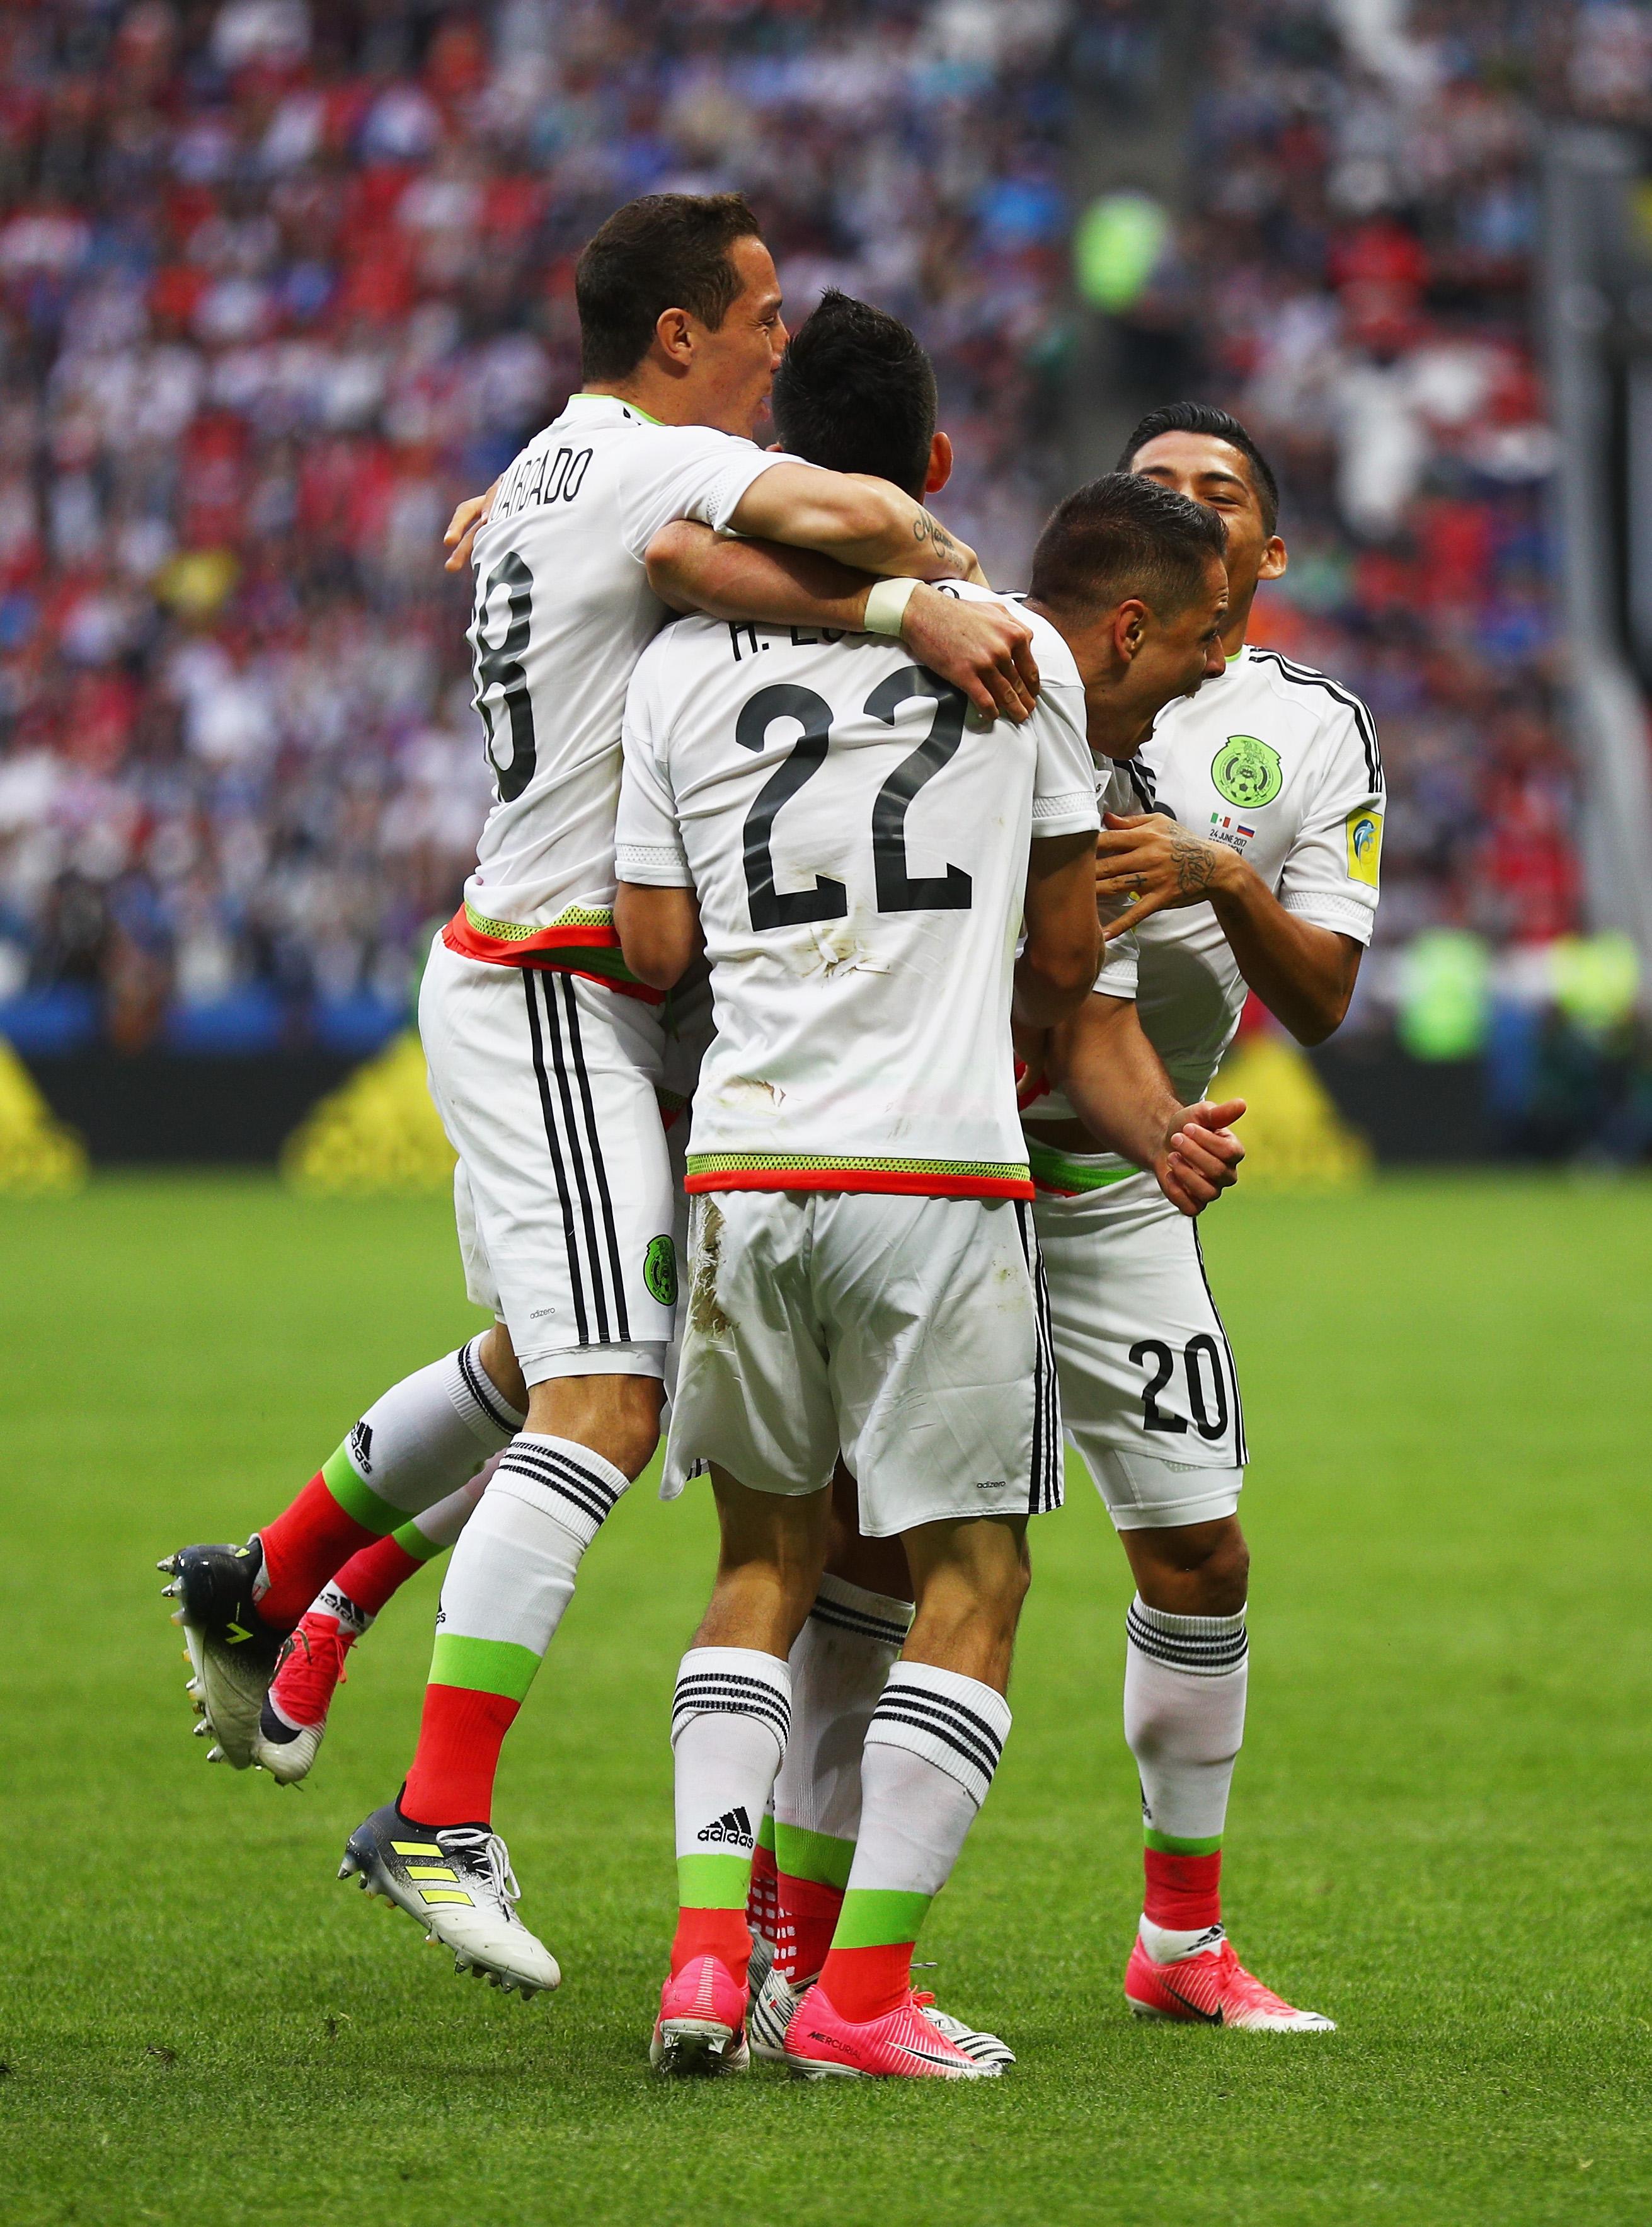 Mexico vs. Russia: Final score 2-1, El Tri knocks hosts out of Confederations Cup